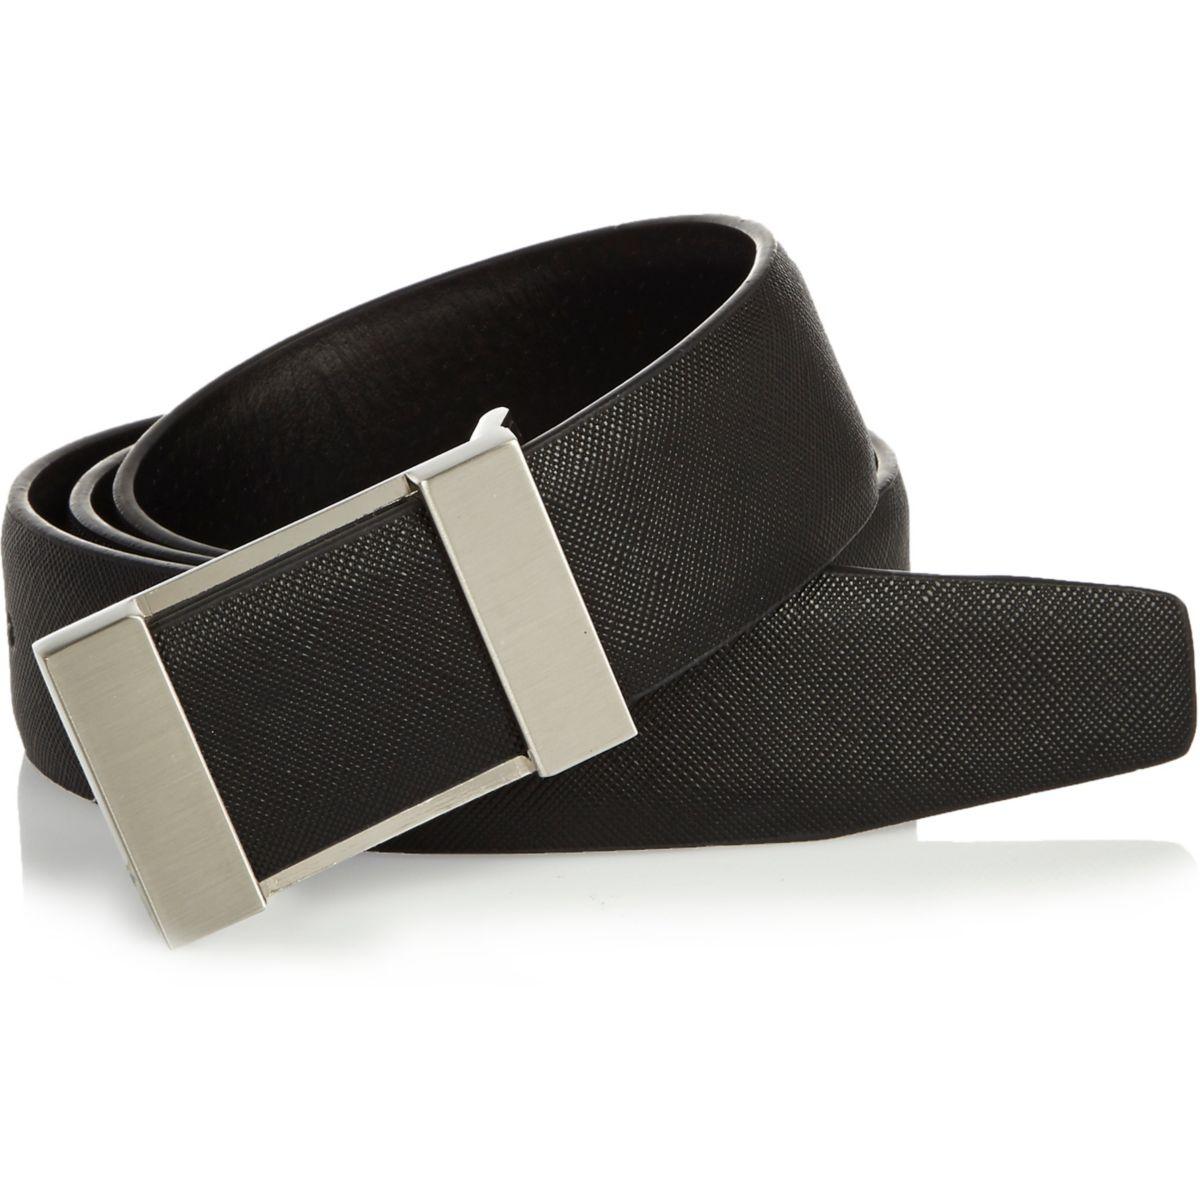 Black plated buckle belt